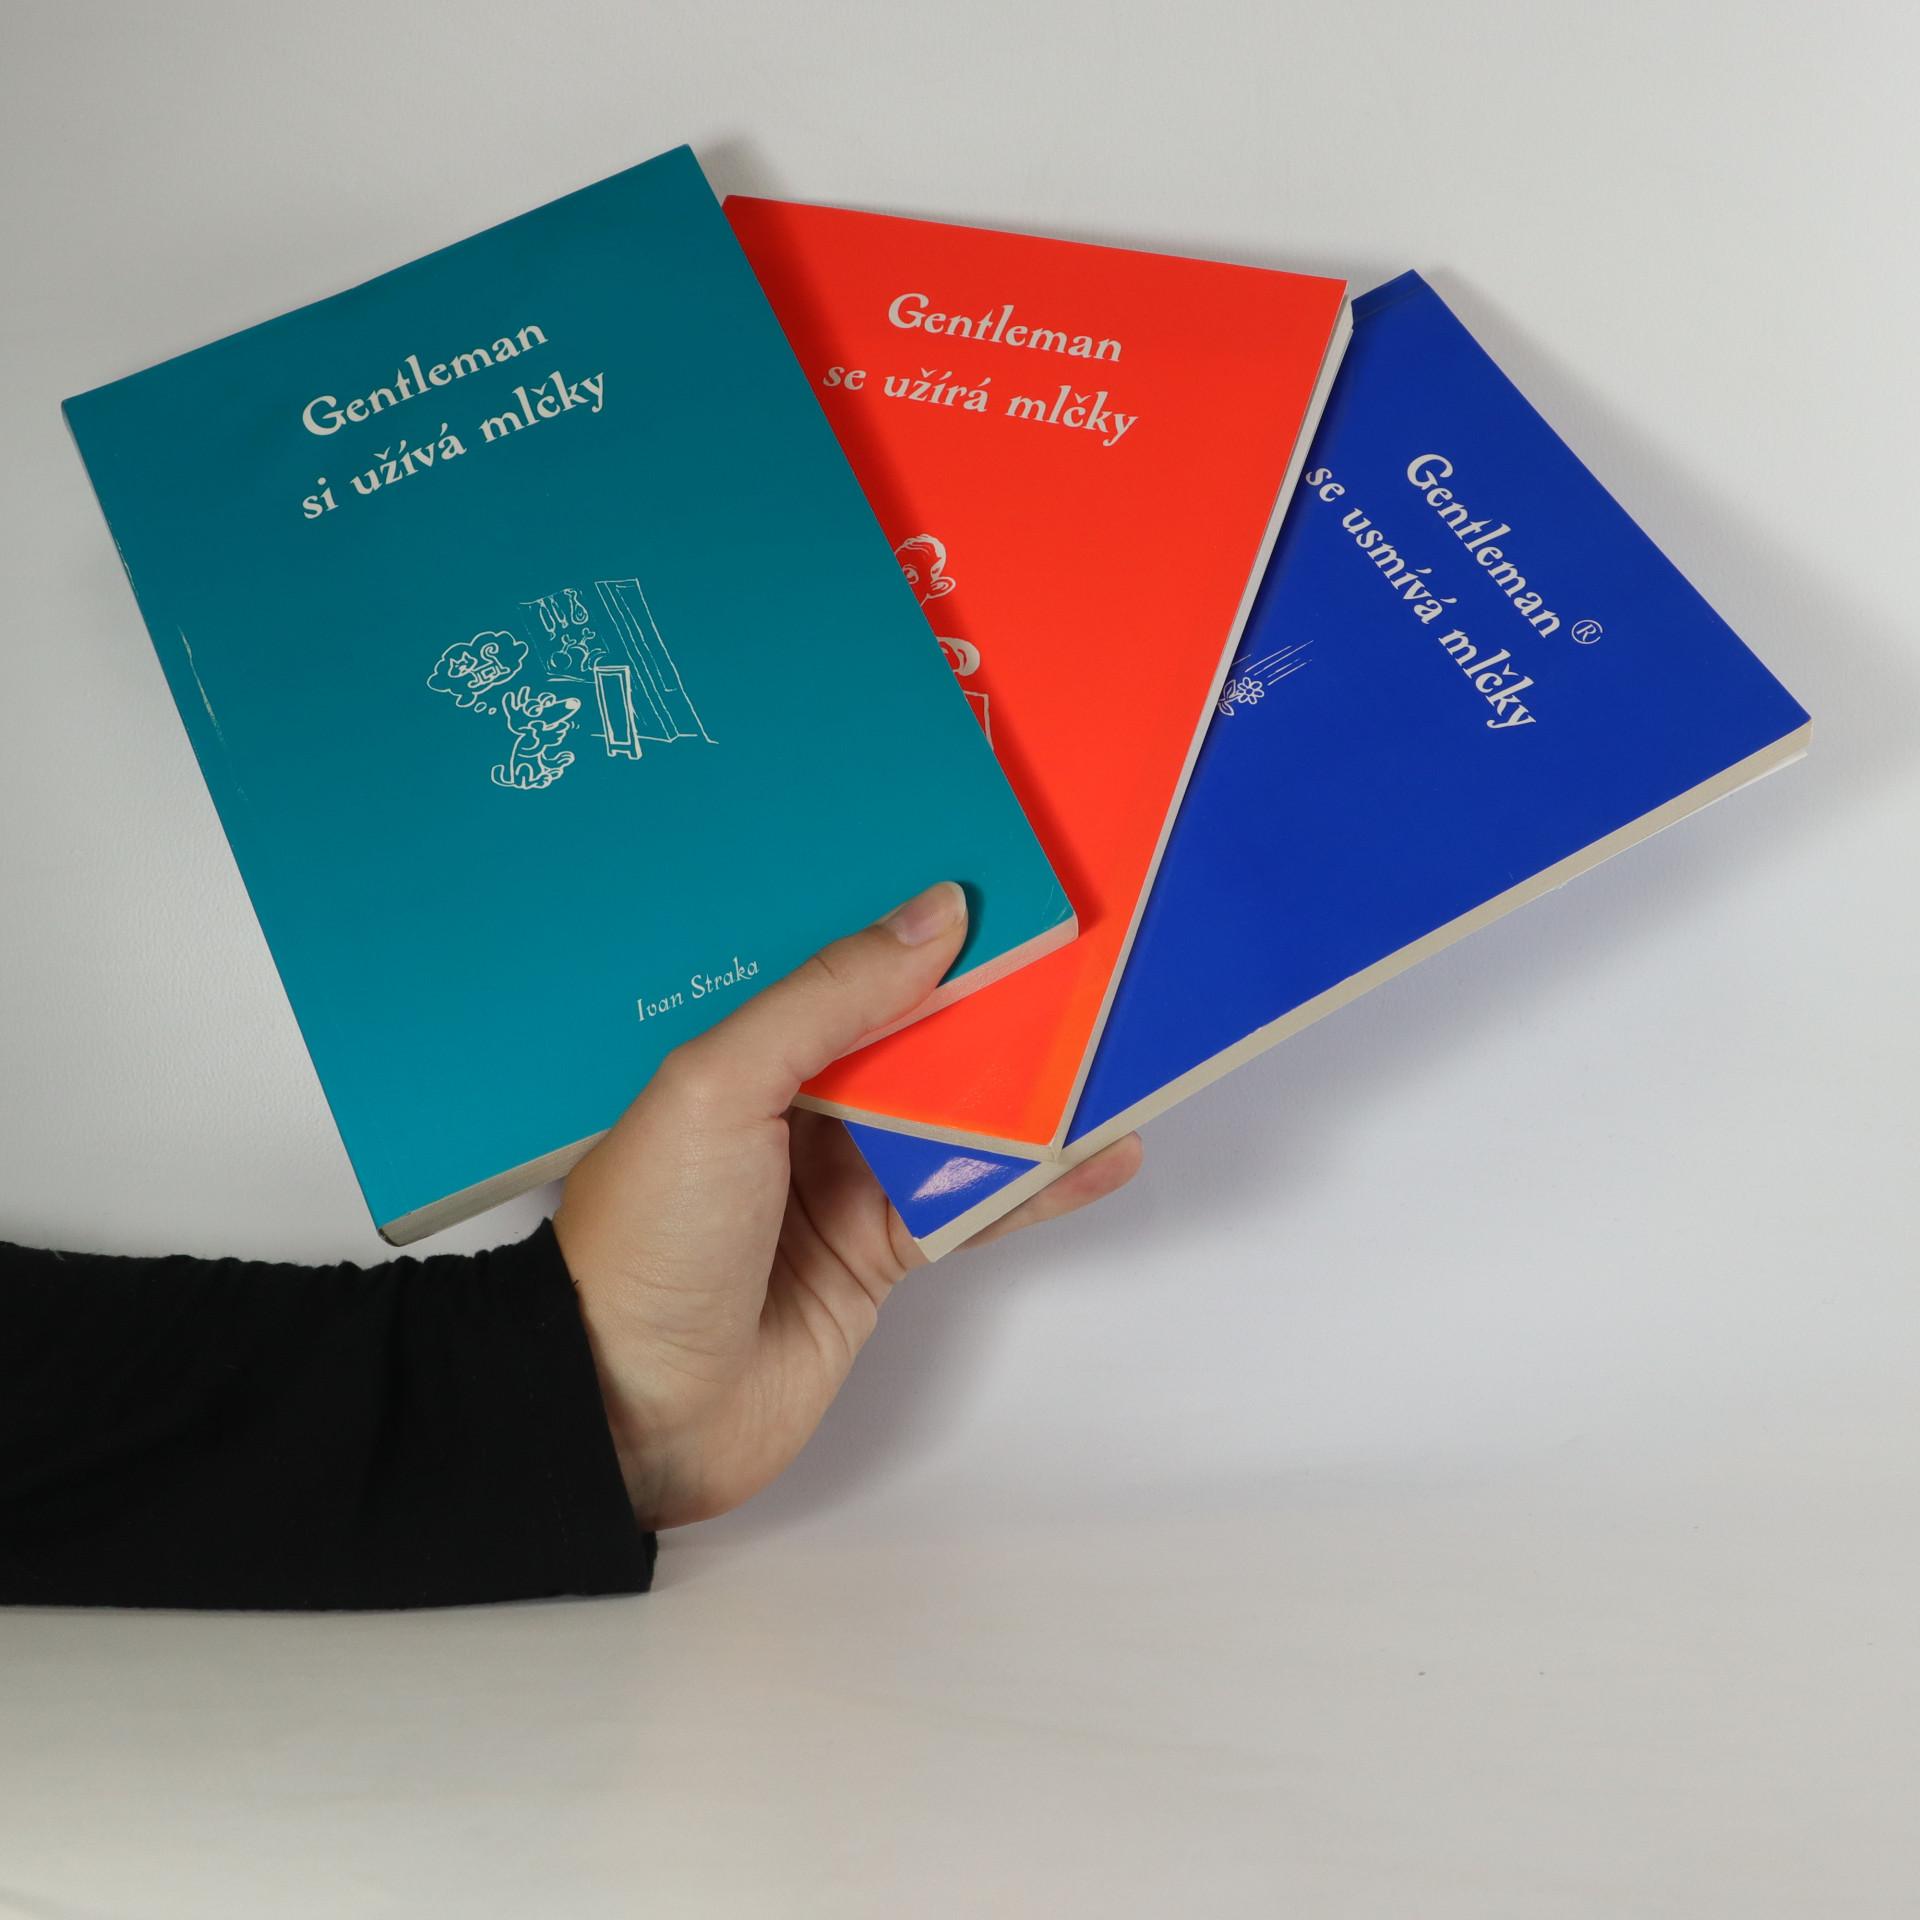 antikvární kniha Gentleman 3x (viz. foto), 1996-1998